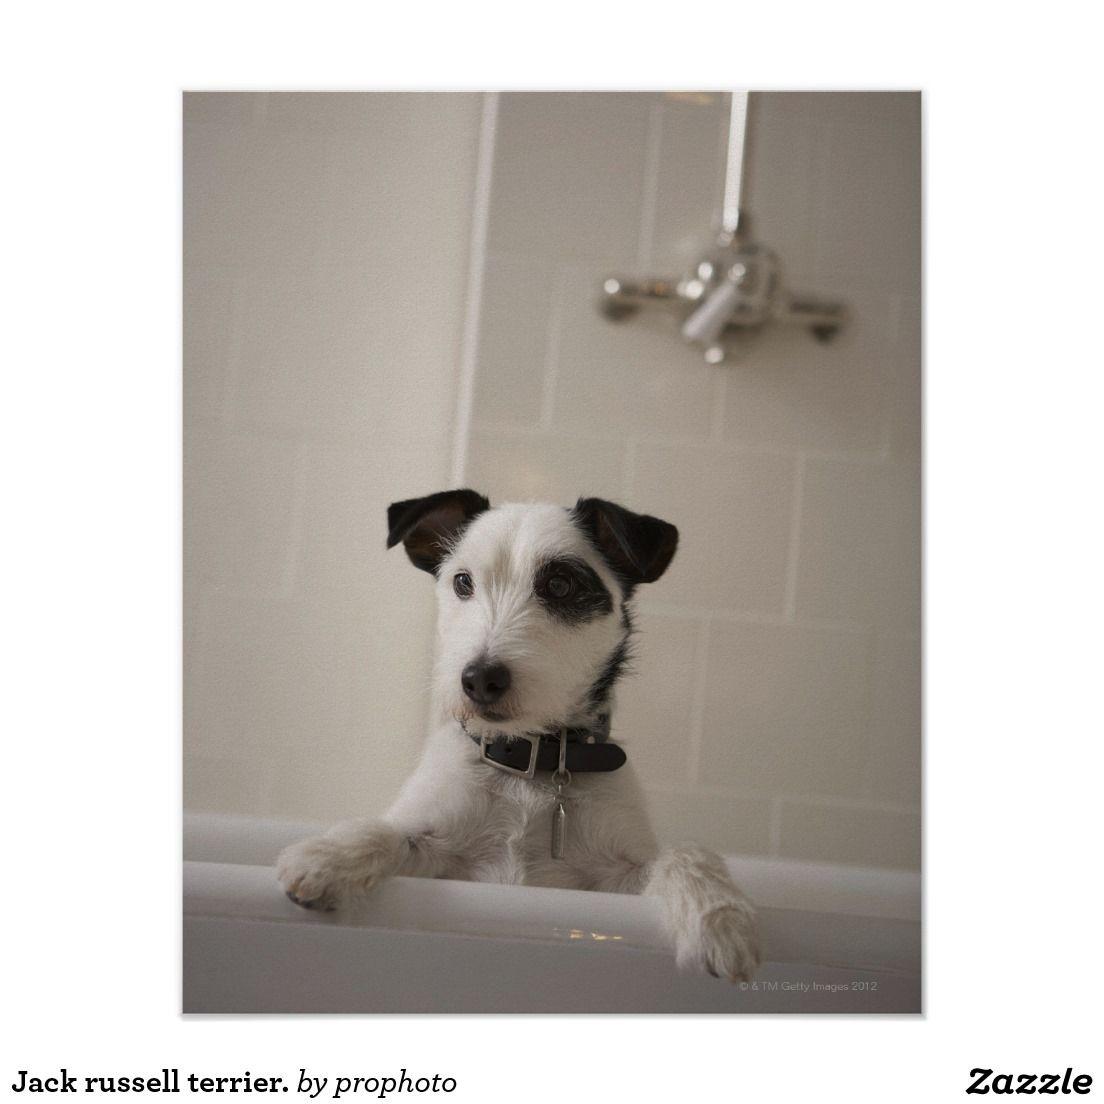 Jack Russell Terrier Poster Zazzle Com Dog Shampoo Diy Dog Shampoo Dogs